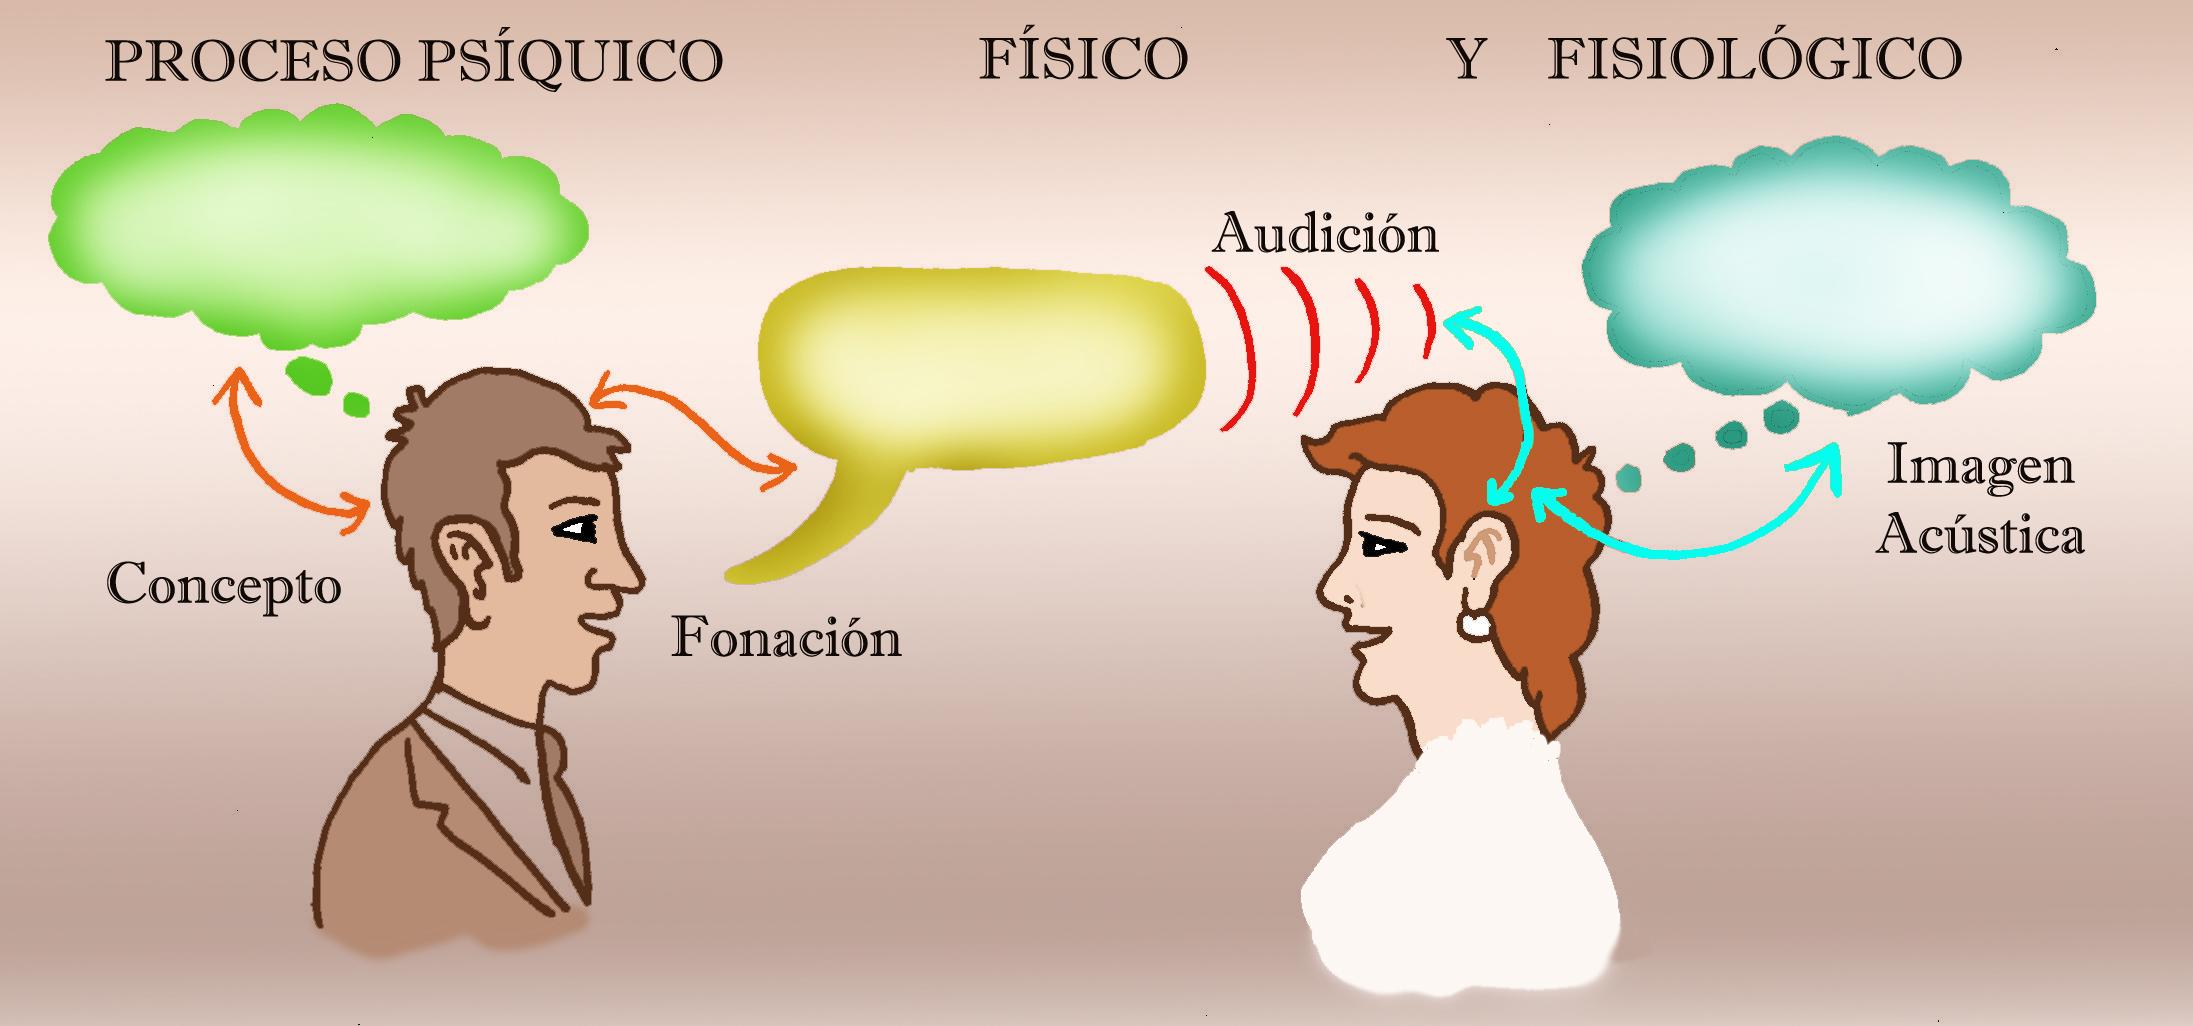 lenguaje el habla: